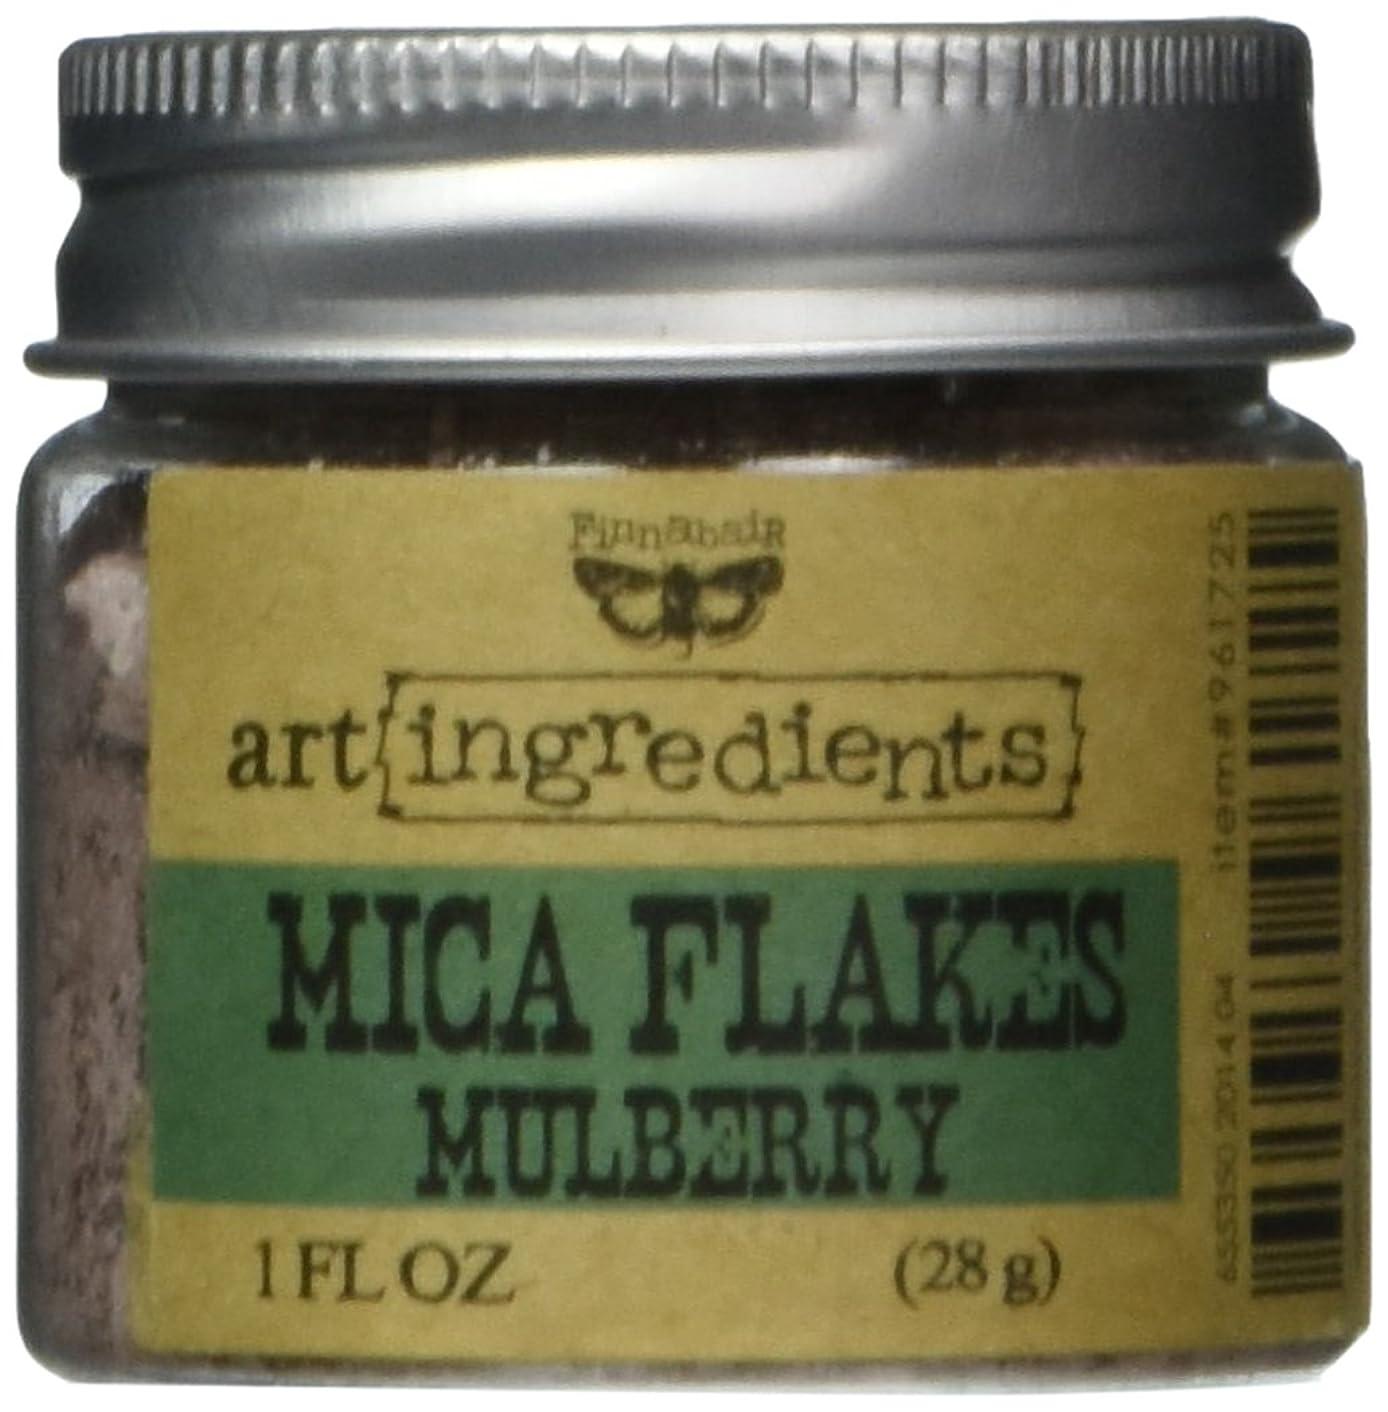 Creative Converting AIMF-96172 Finnabair Art Ingredients Mica Flakes, 1 oz, Mulberry